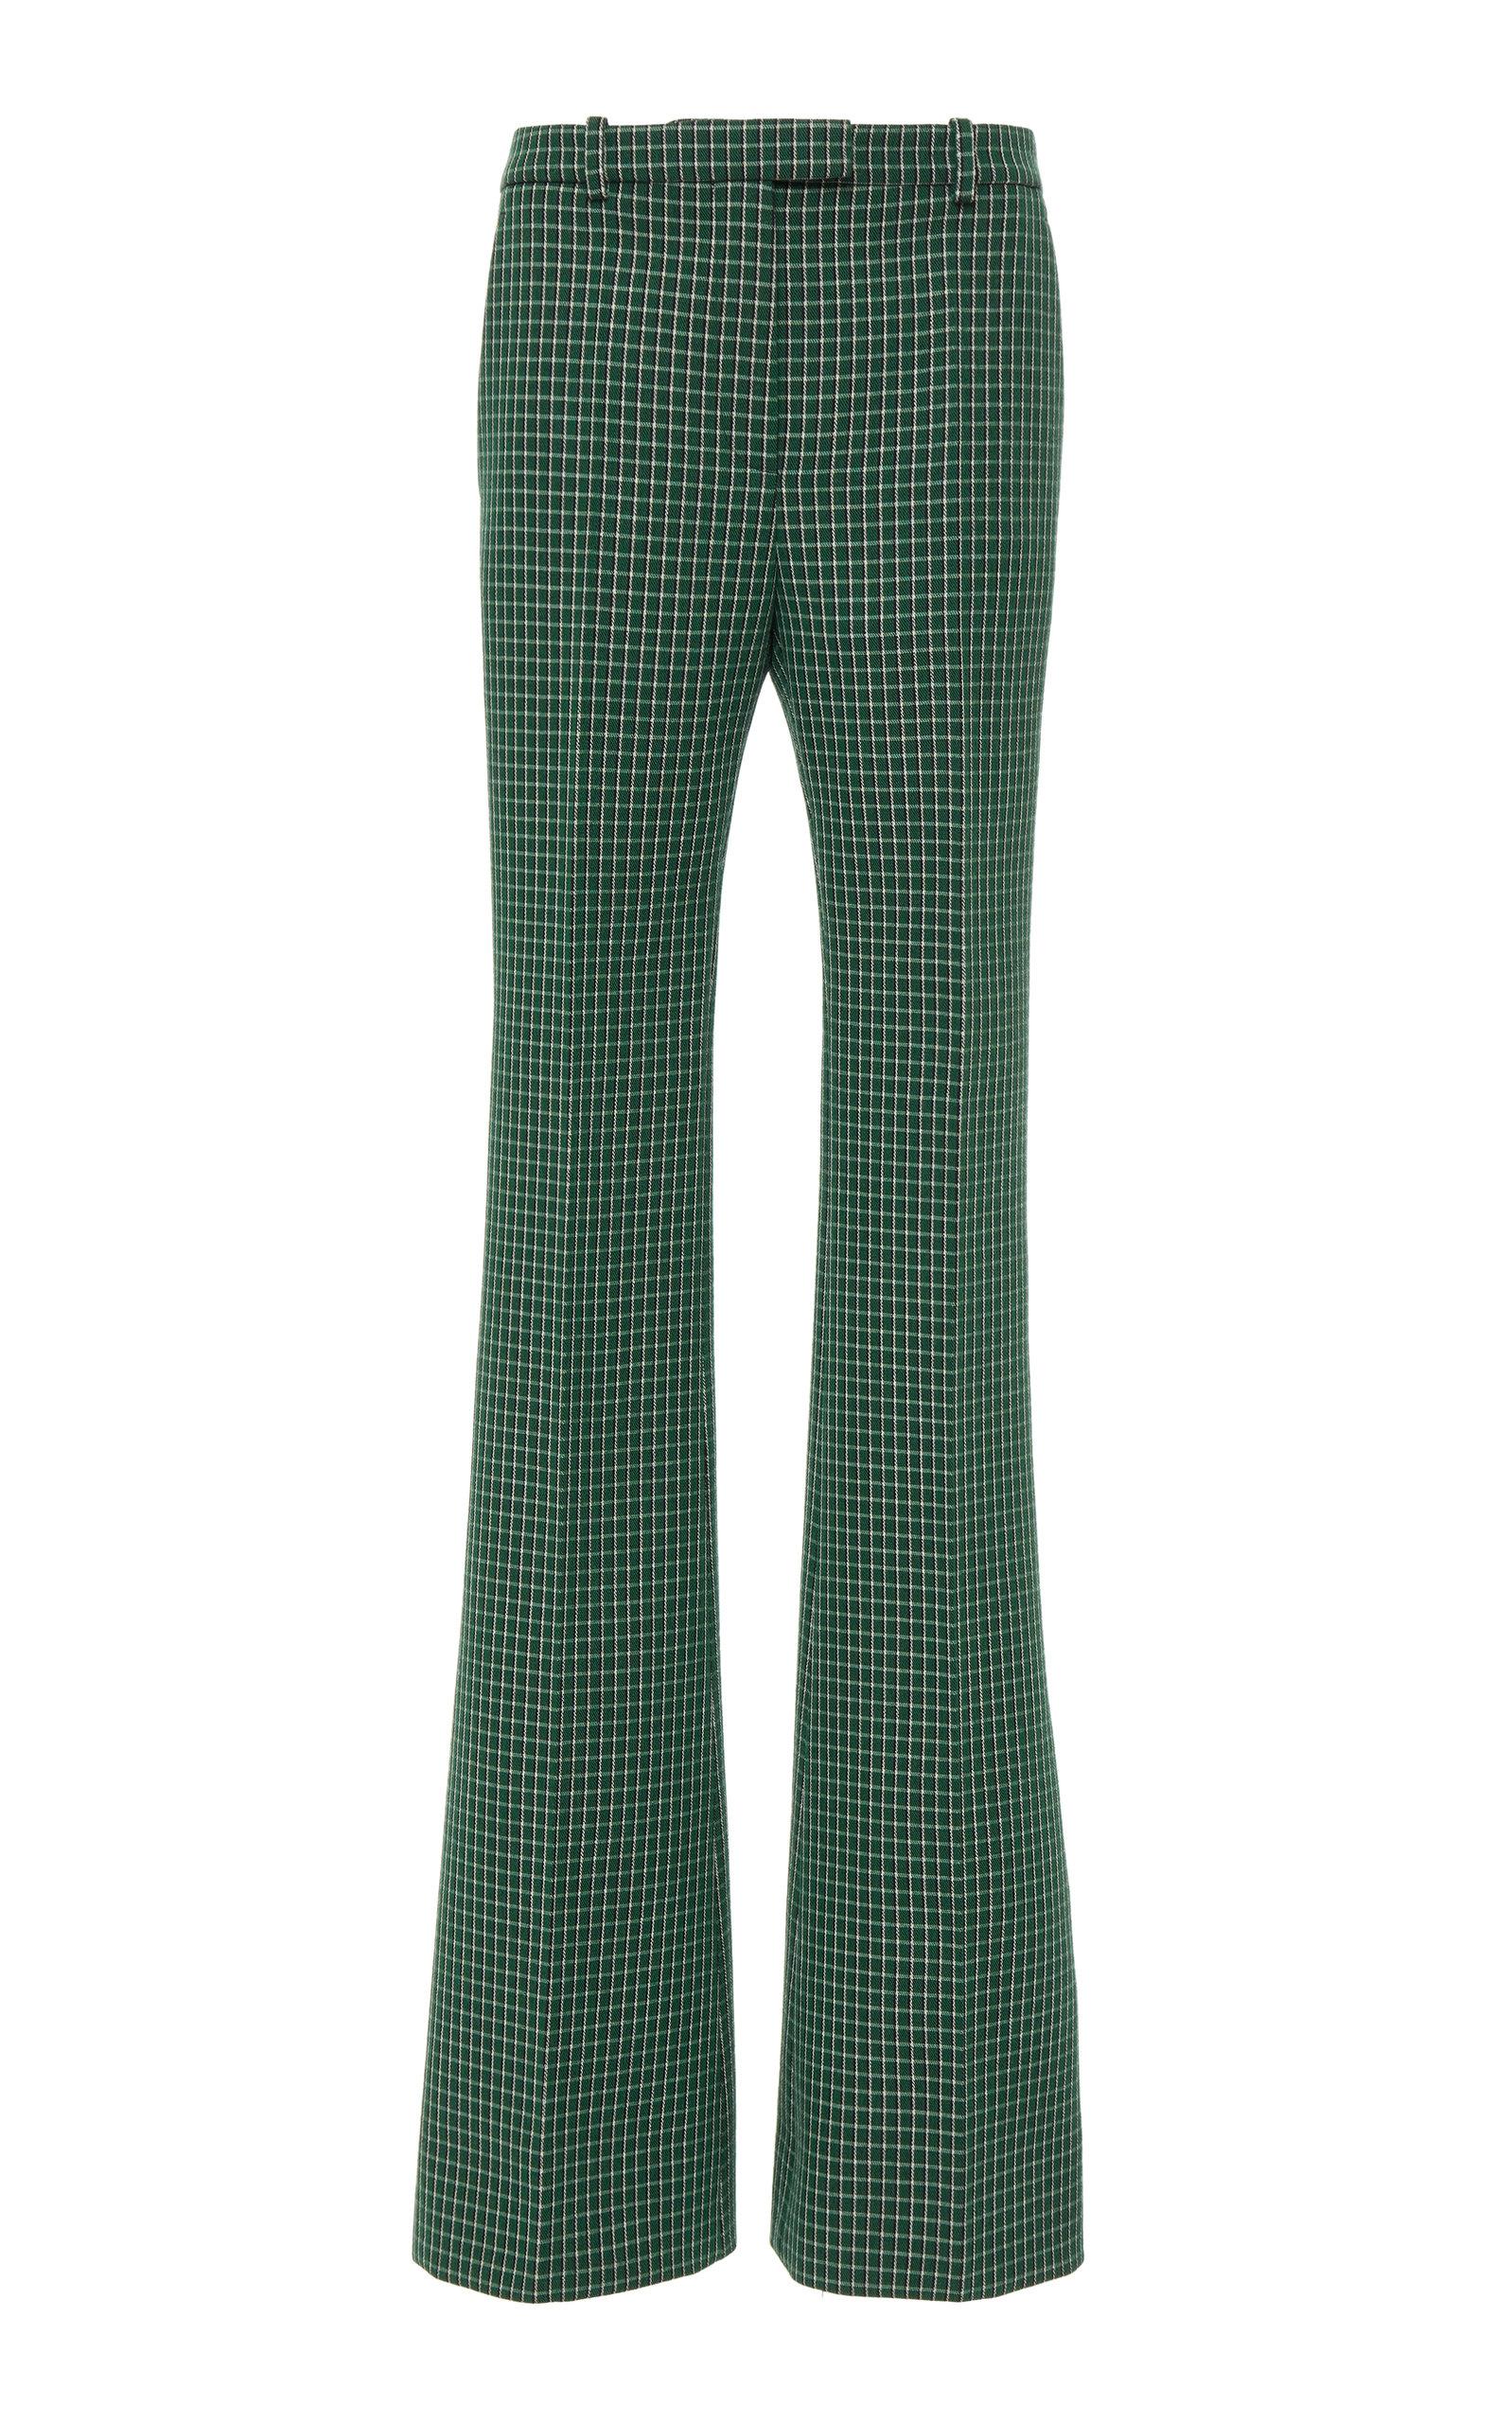 Givenchy Pants Checked Wool-Crepe Straight-Leg Pants